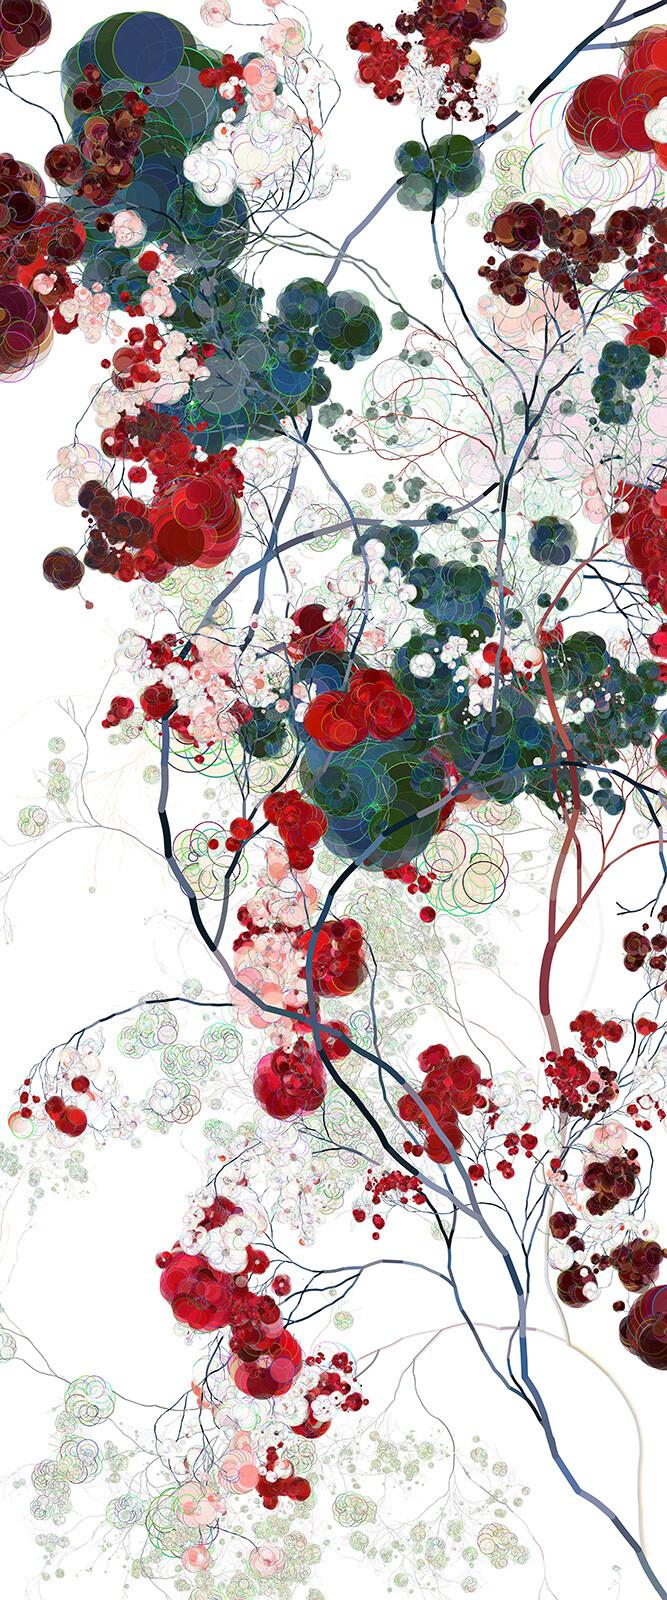 Run into Roses II - Holger Lippmann